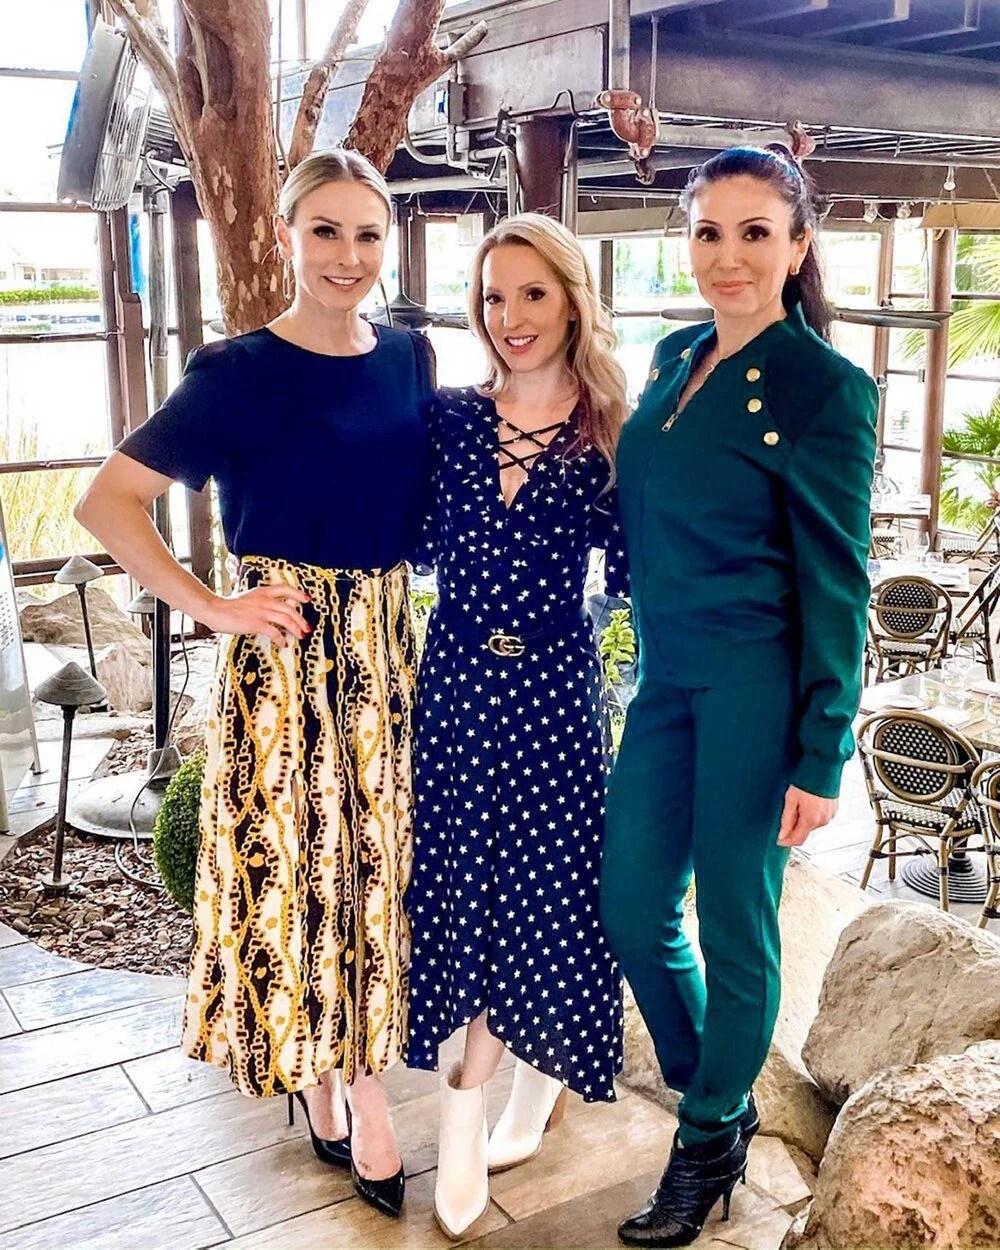 3 women fashion bloggers wearing fall boots 2021